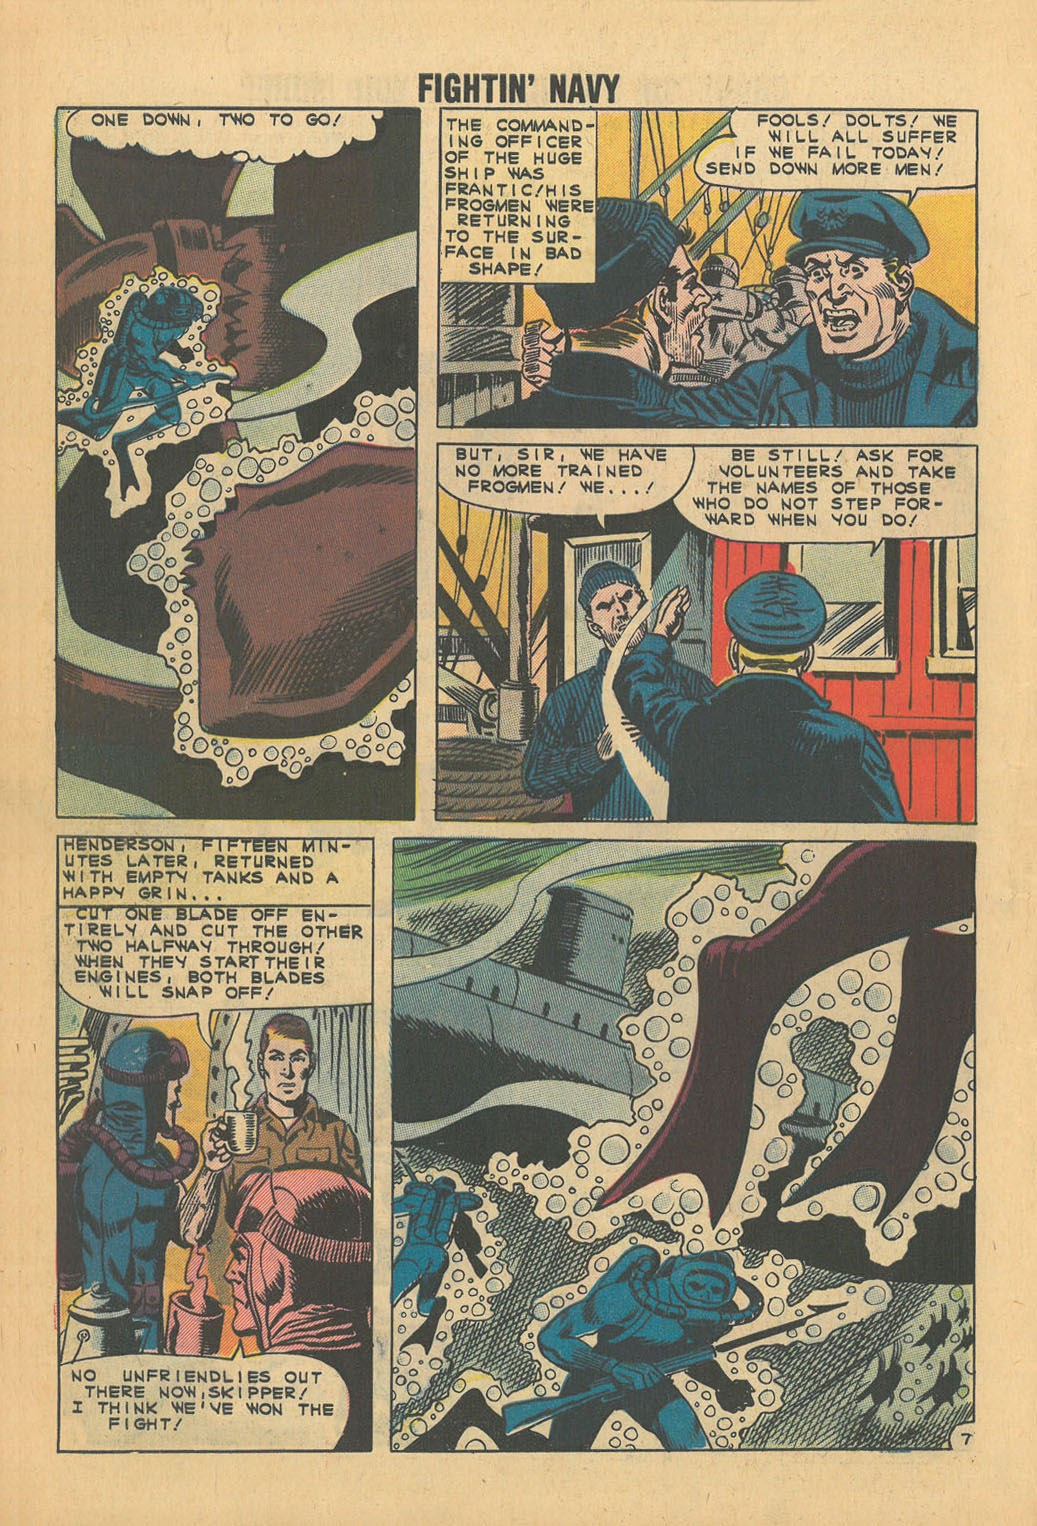 Read online Fightin' Navy comic -  Issue #100 - 10